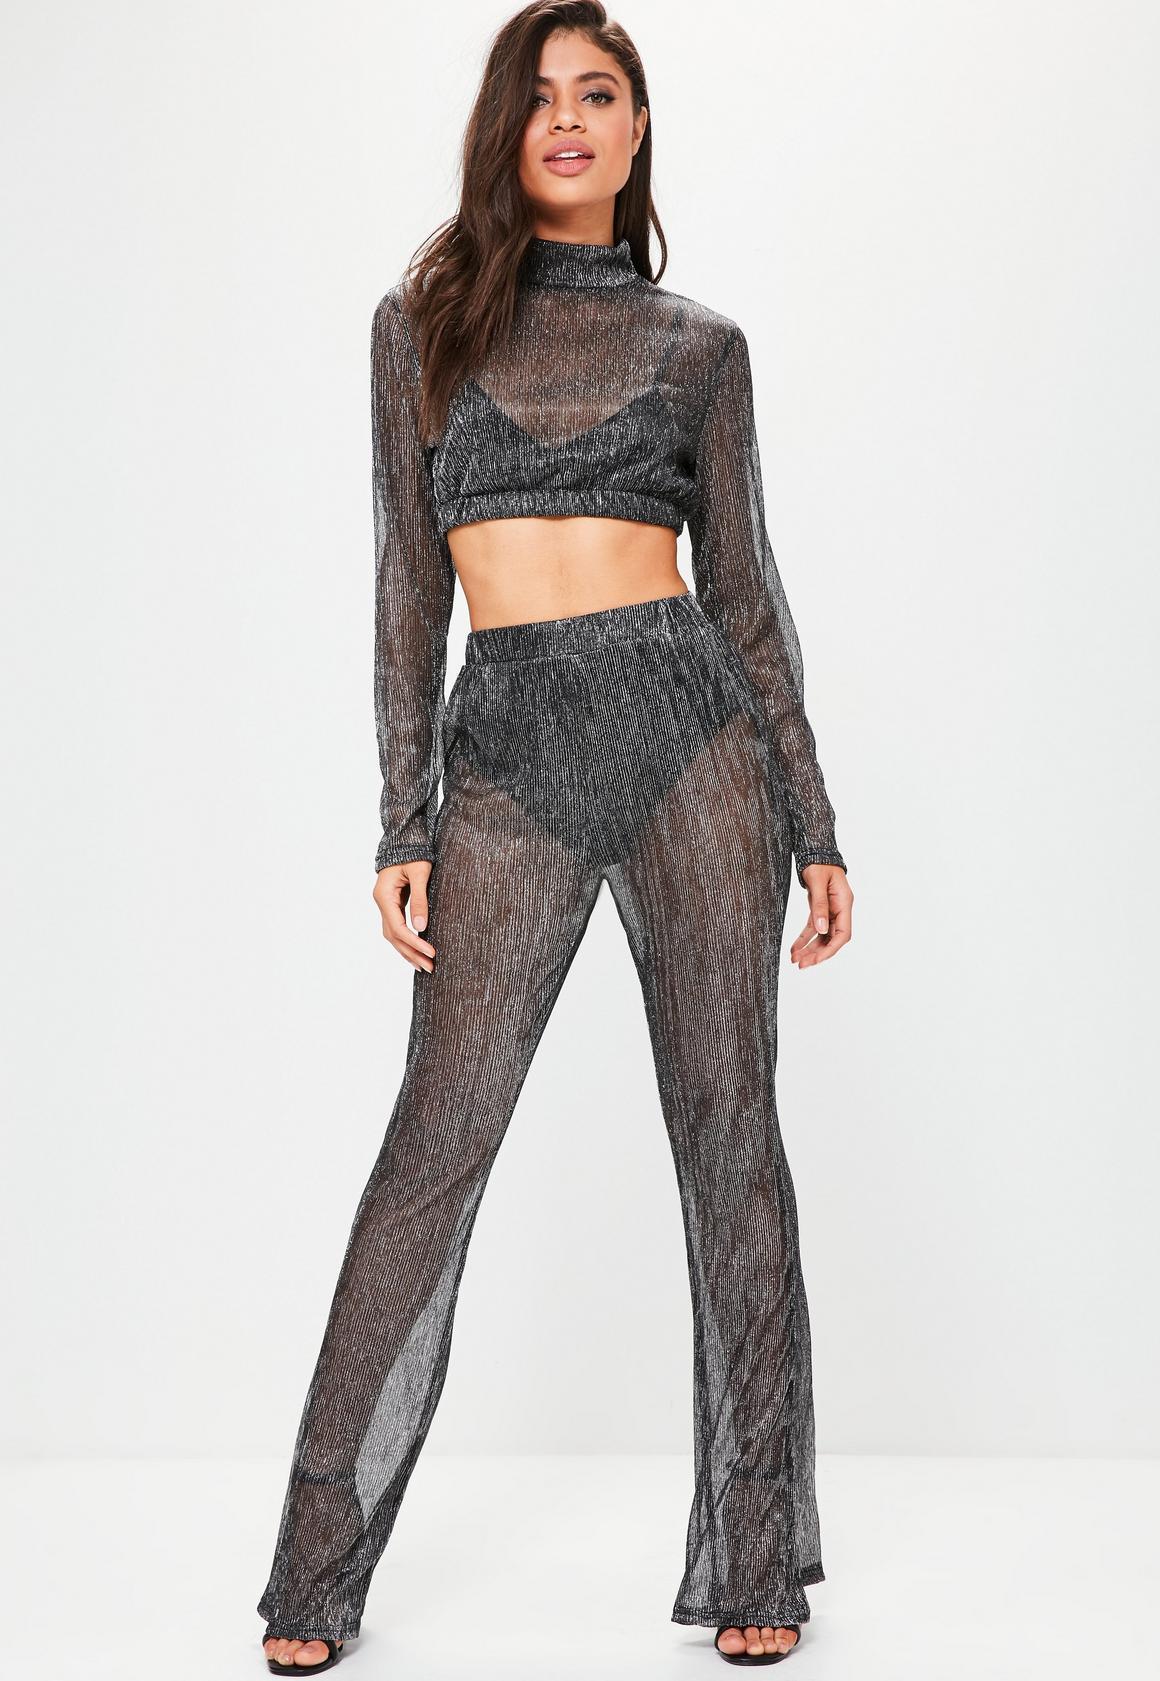 Black Sparkle Metallic High Waisted Pants | Missguided